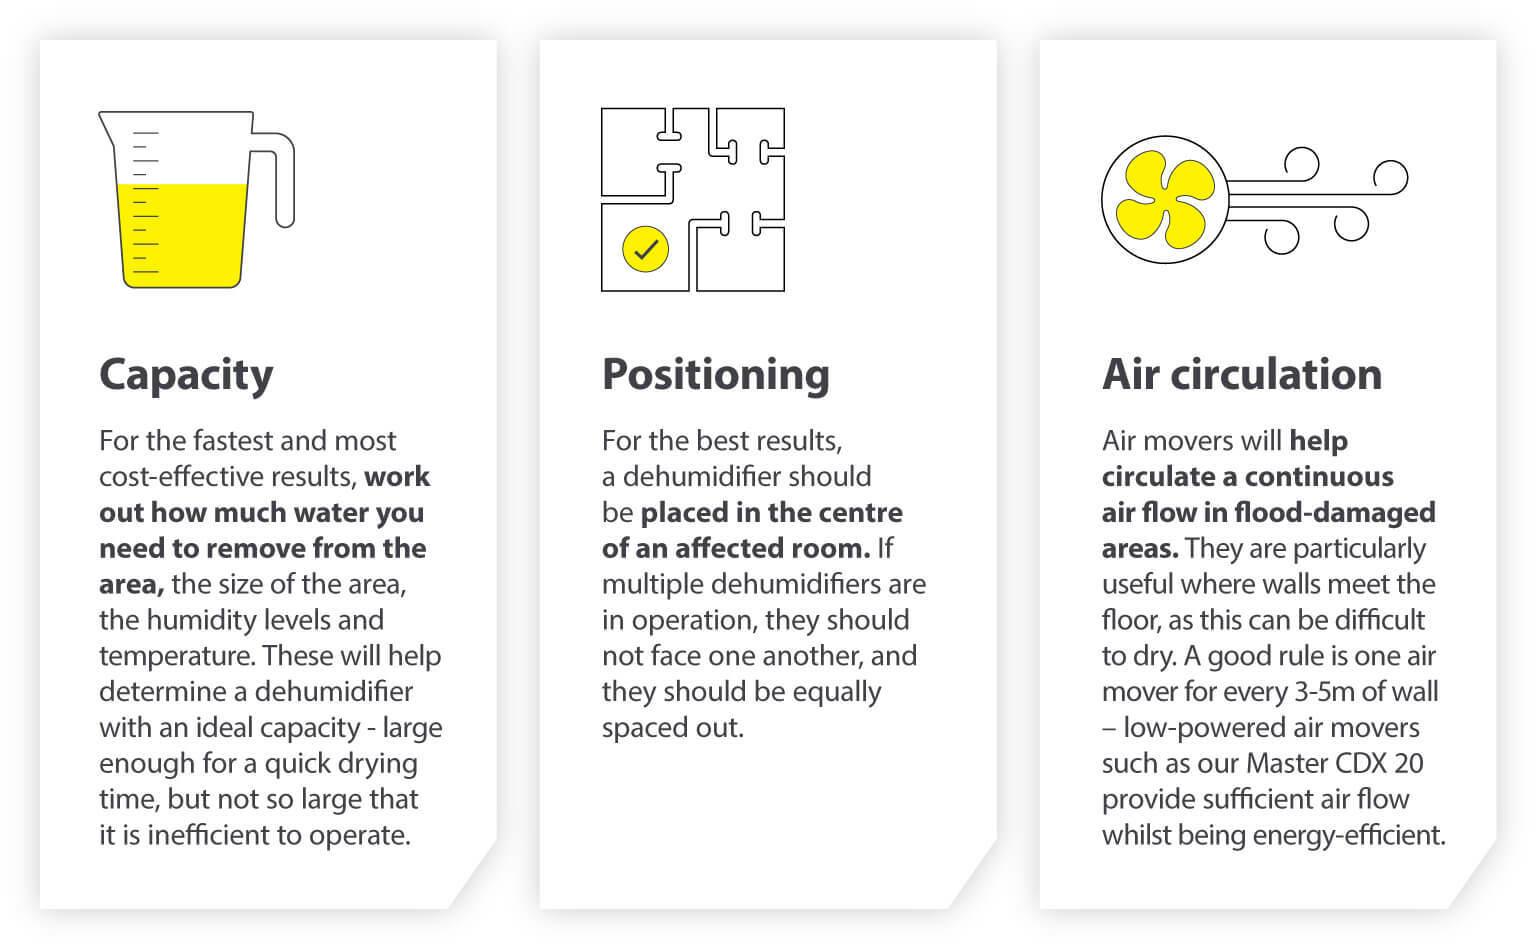 Choosing the right dehumidifier